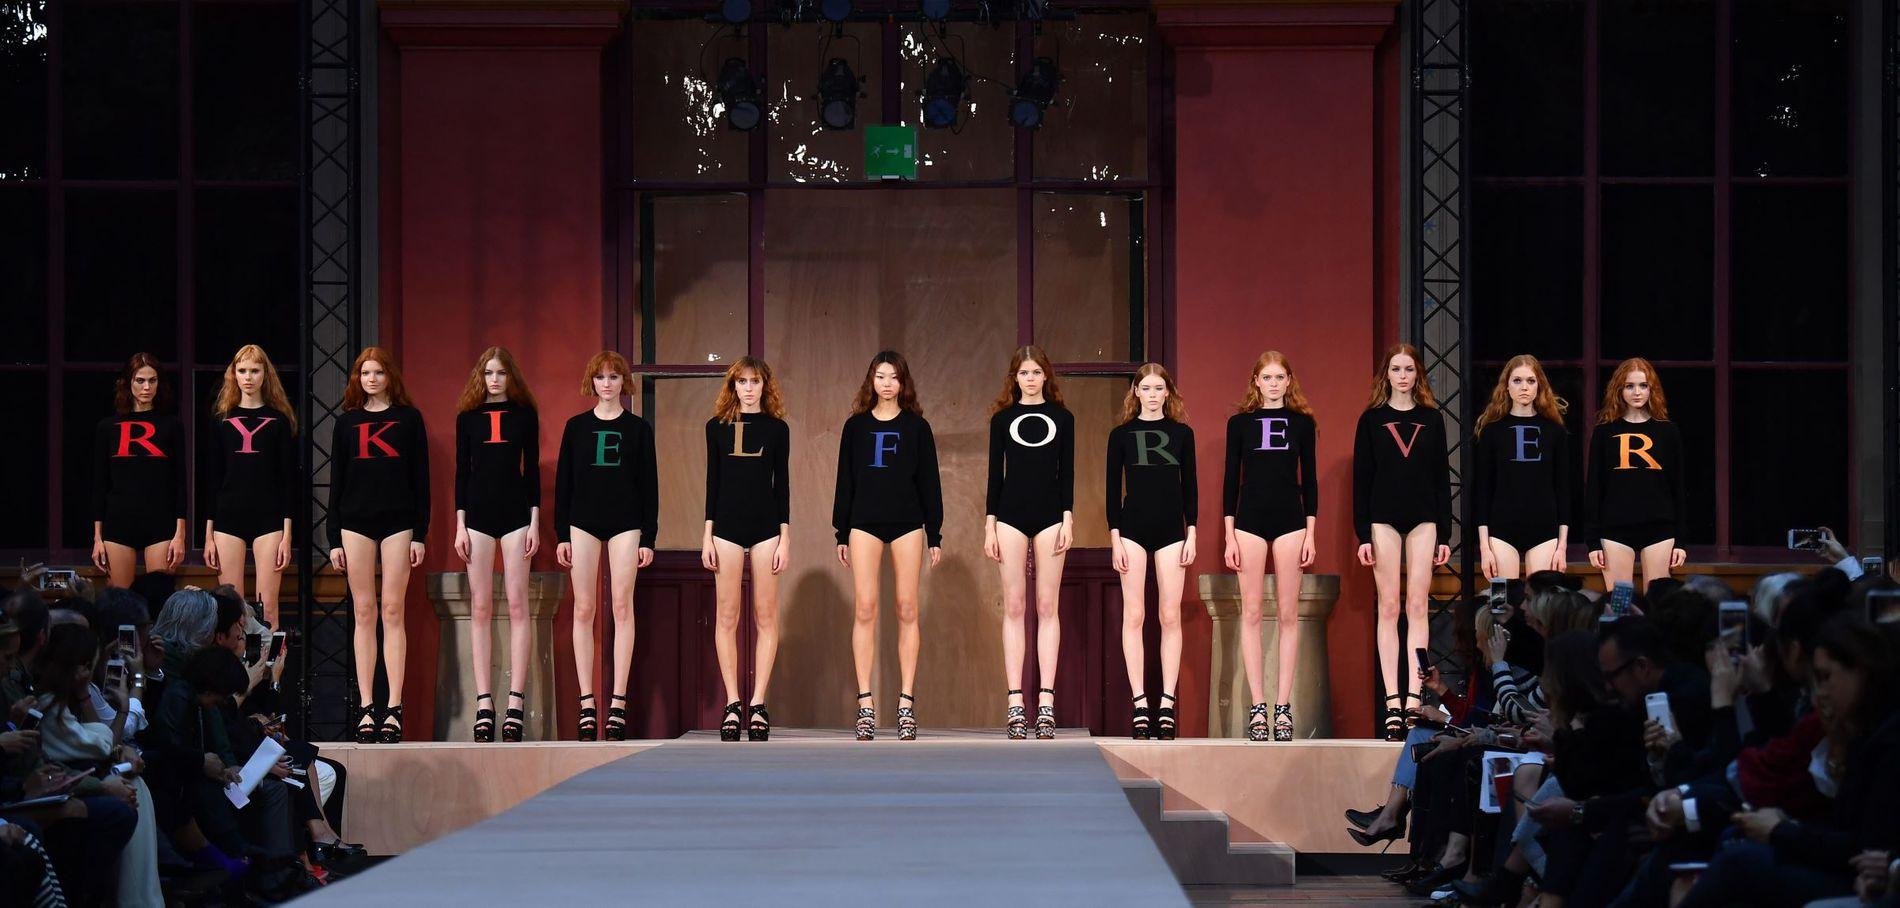 Le-defile-Sonia-Rykiel-a-la-fashion-week-de-Paris_exact1900x908_l.jpg